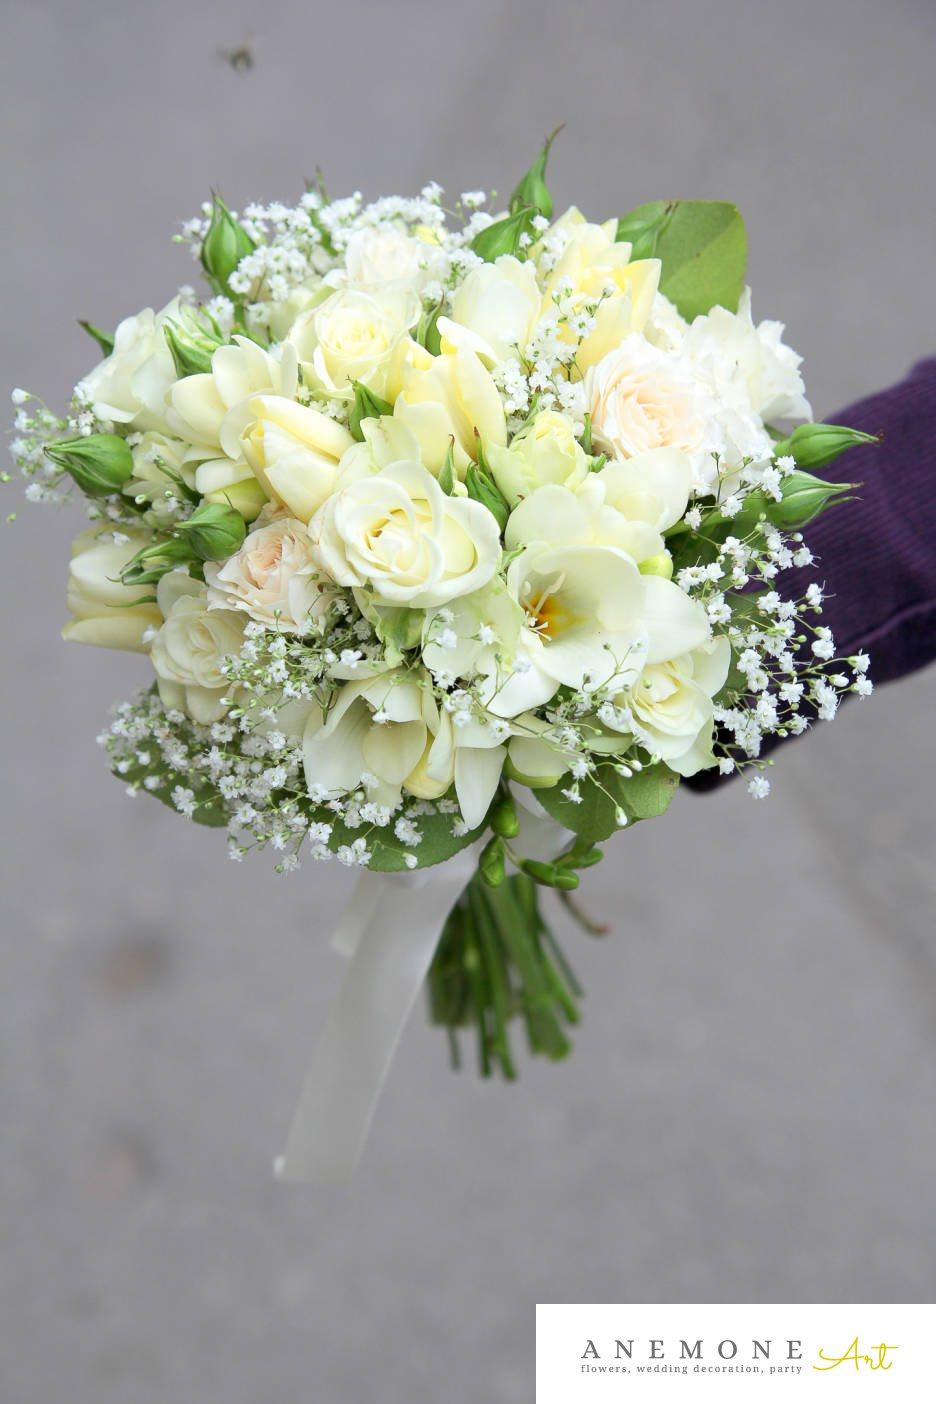 Poza, foto cu Flori de nunta alb, buchet mireasa, crem, gipsofila, lalele, rotund, trandafiri in Arad, Timisoara, Oradea (wedding flowers, bouquets) nunta Arad, Timisoara, Oradea